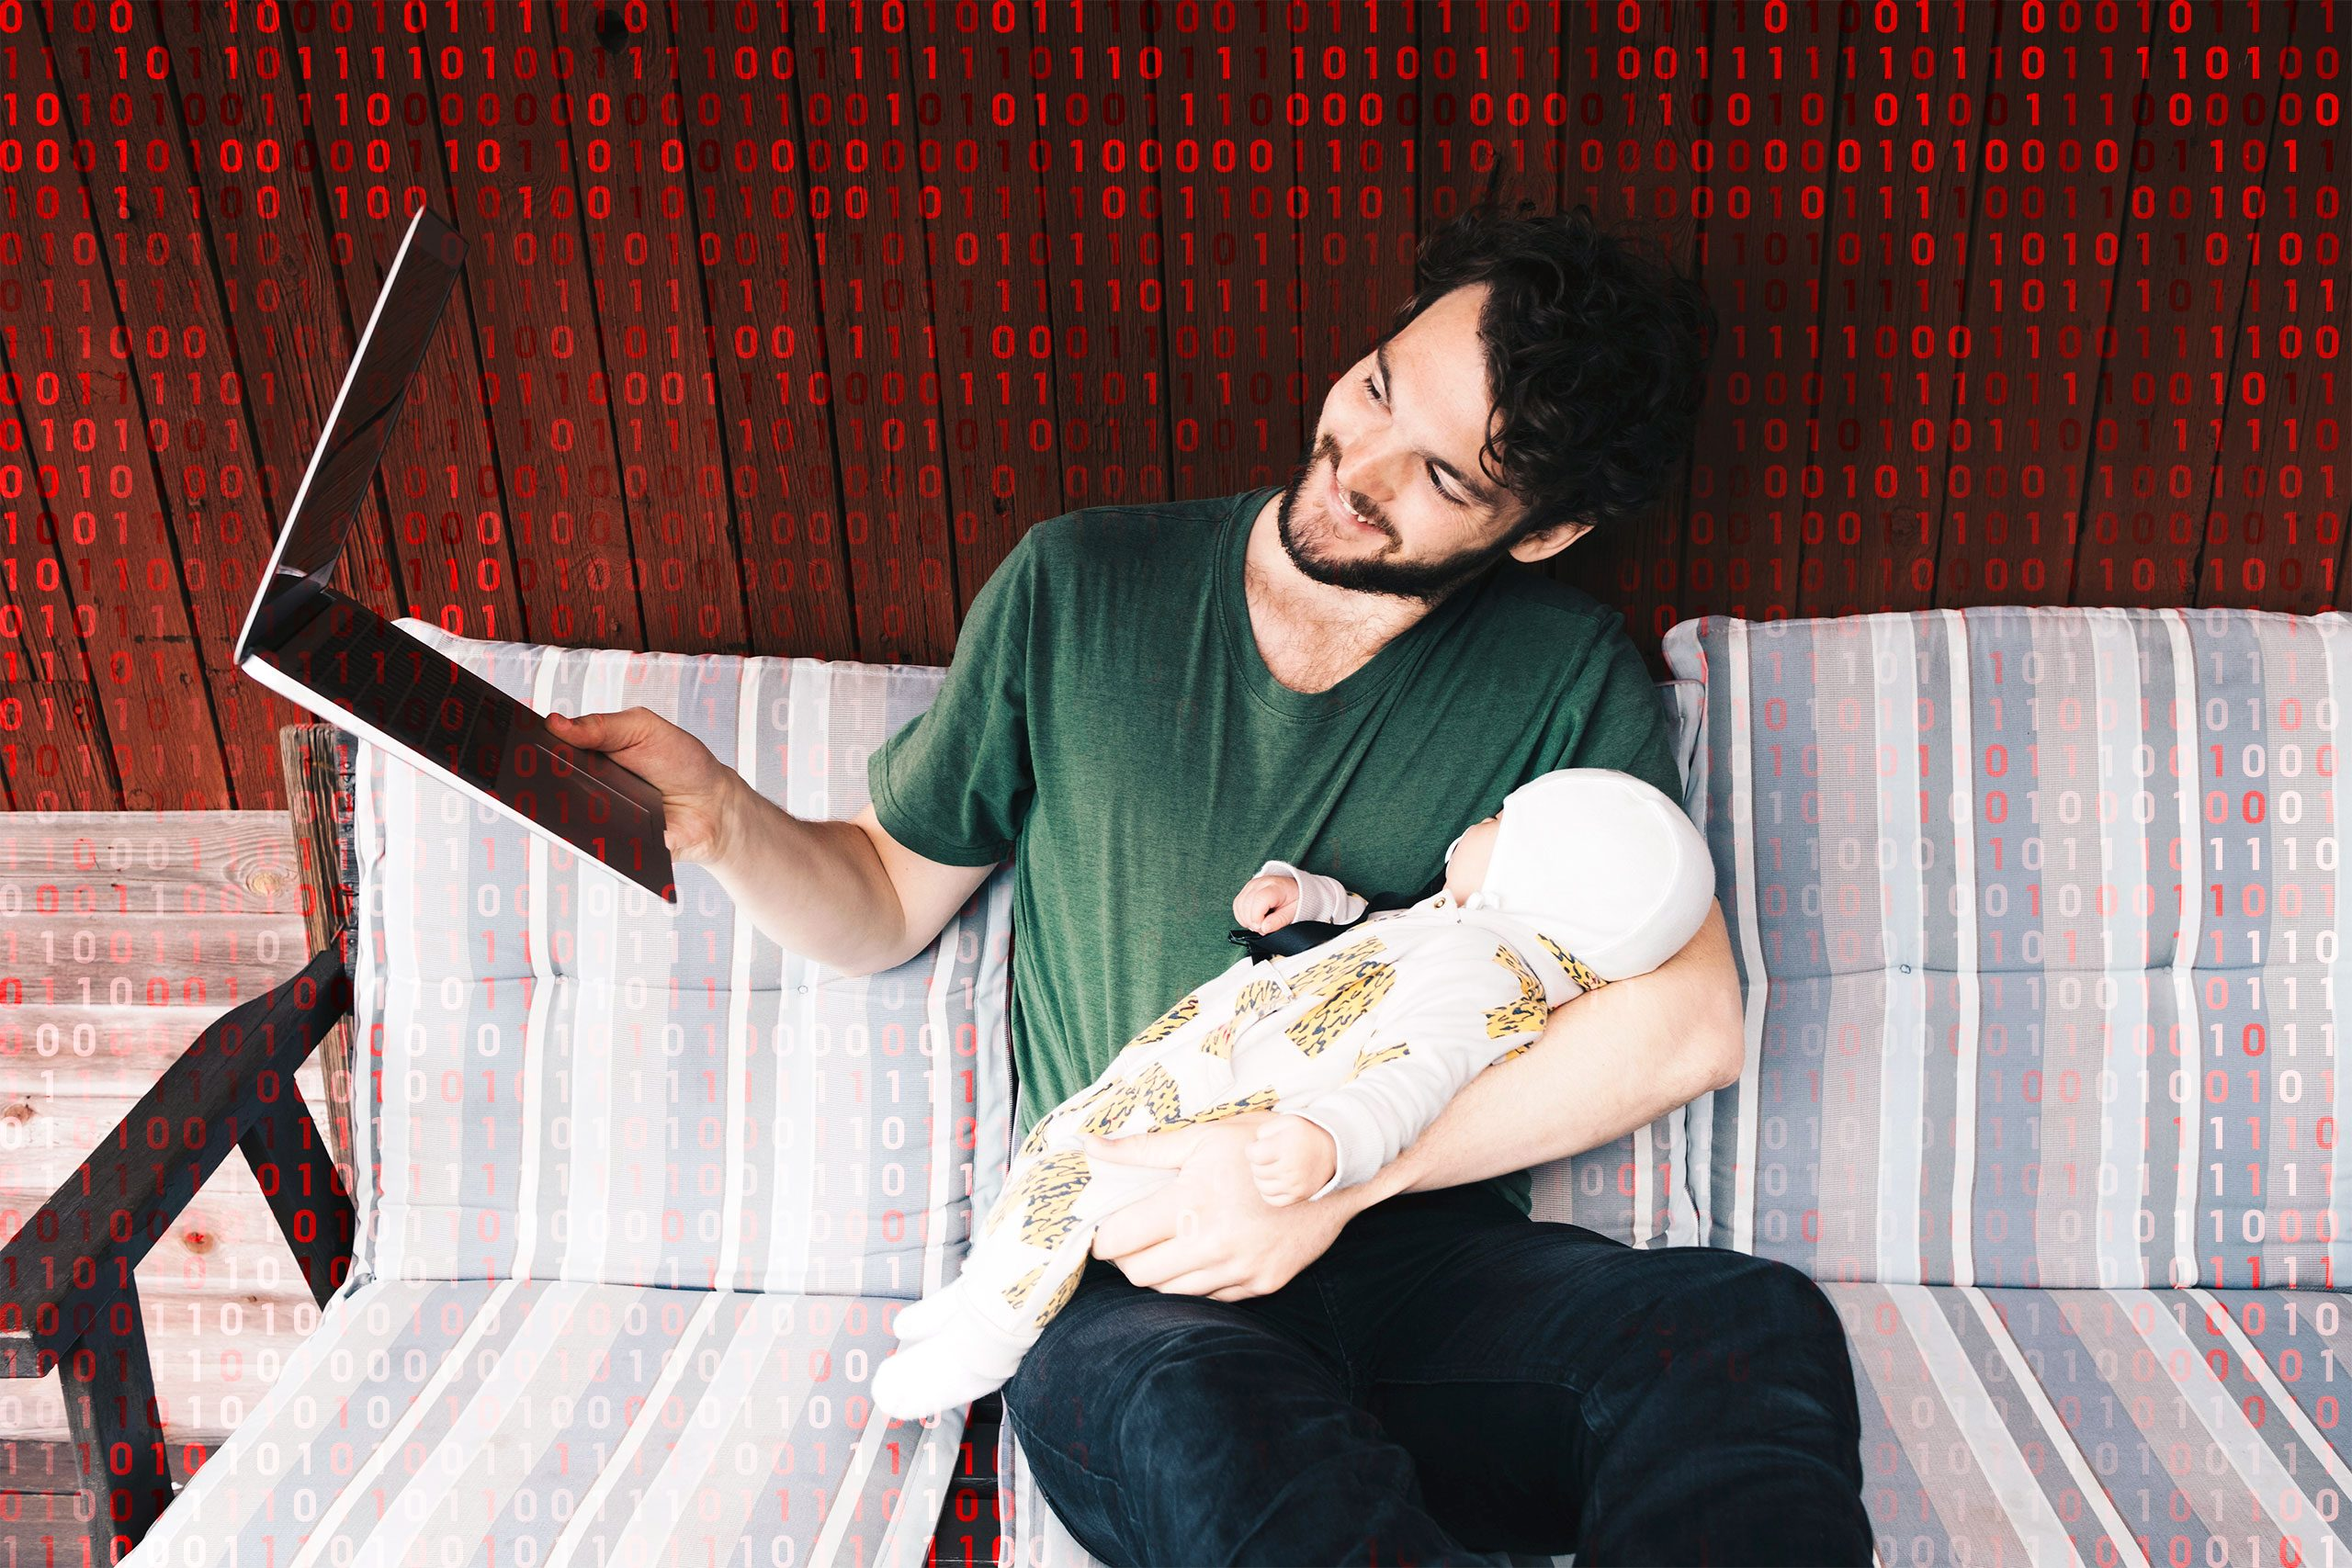 man holding baby using zoom; computer code overlay